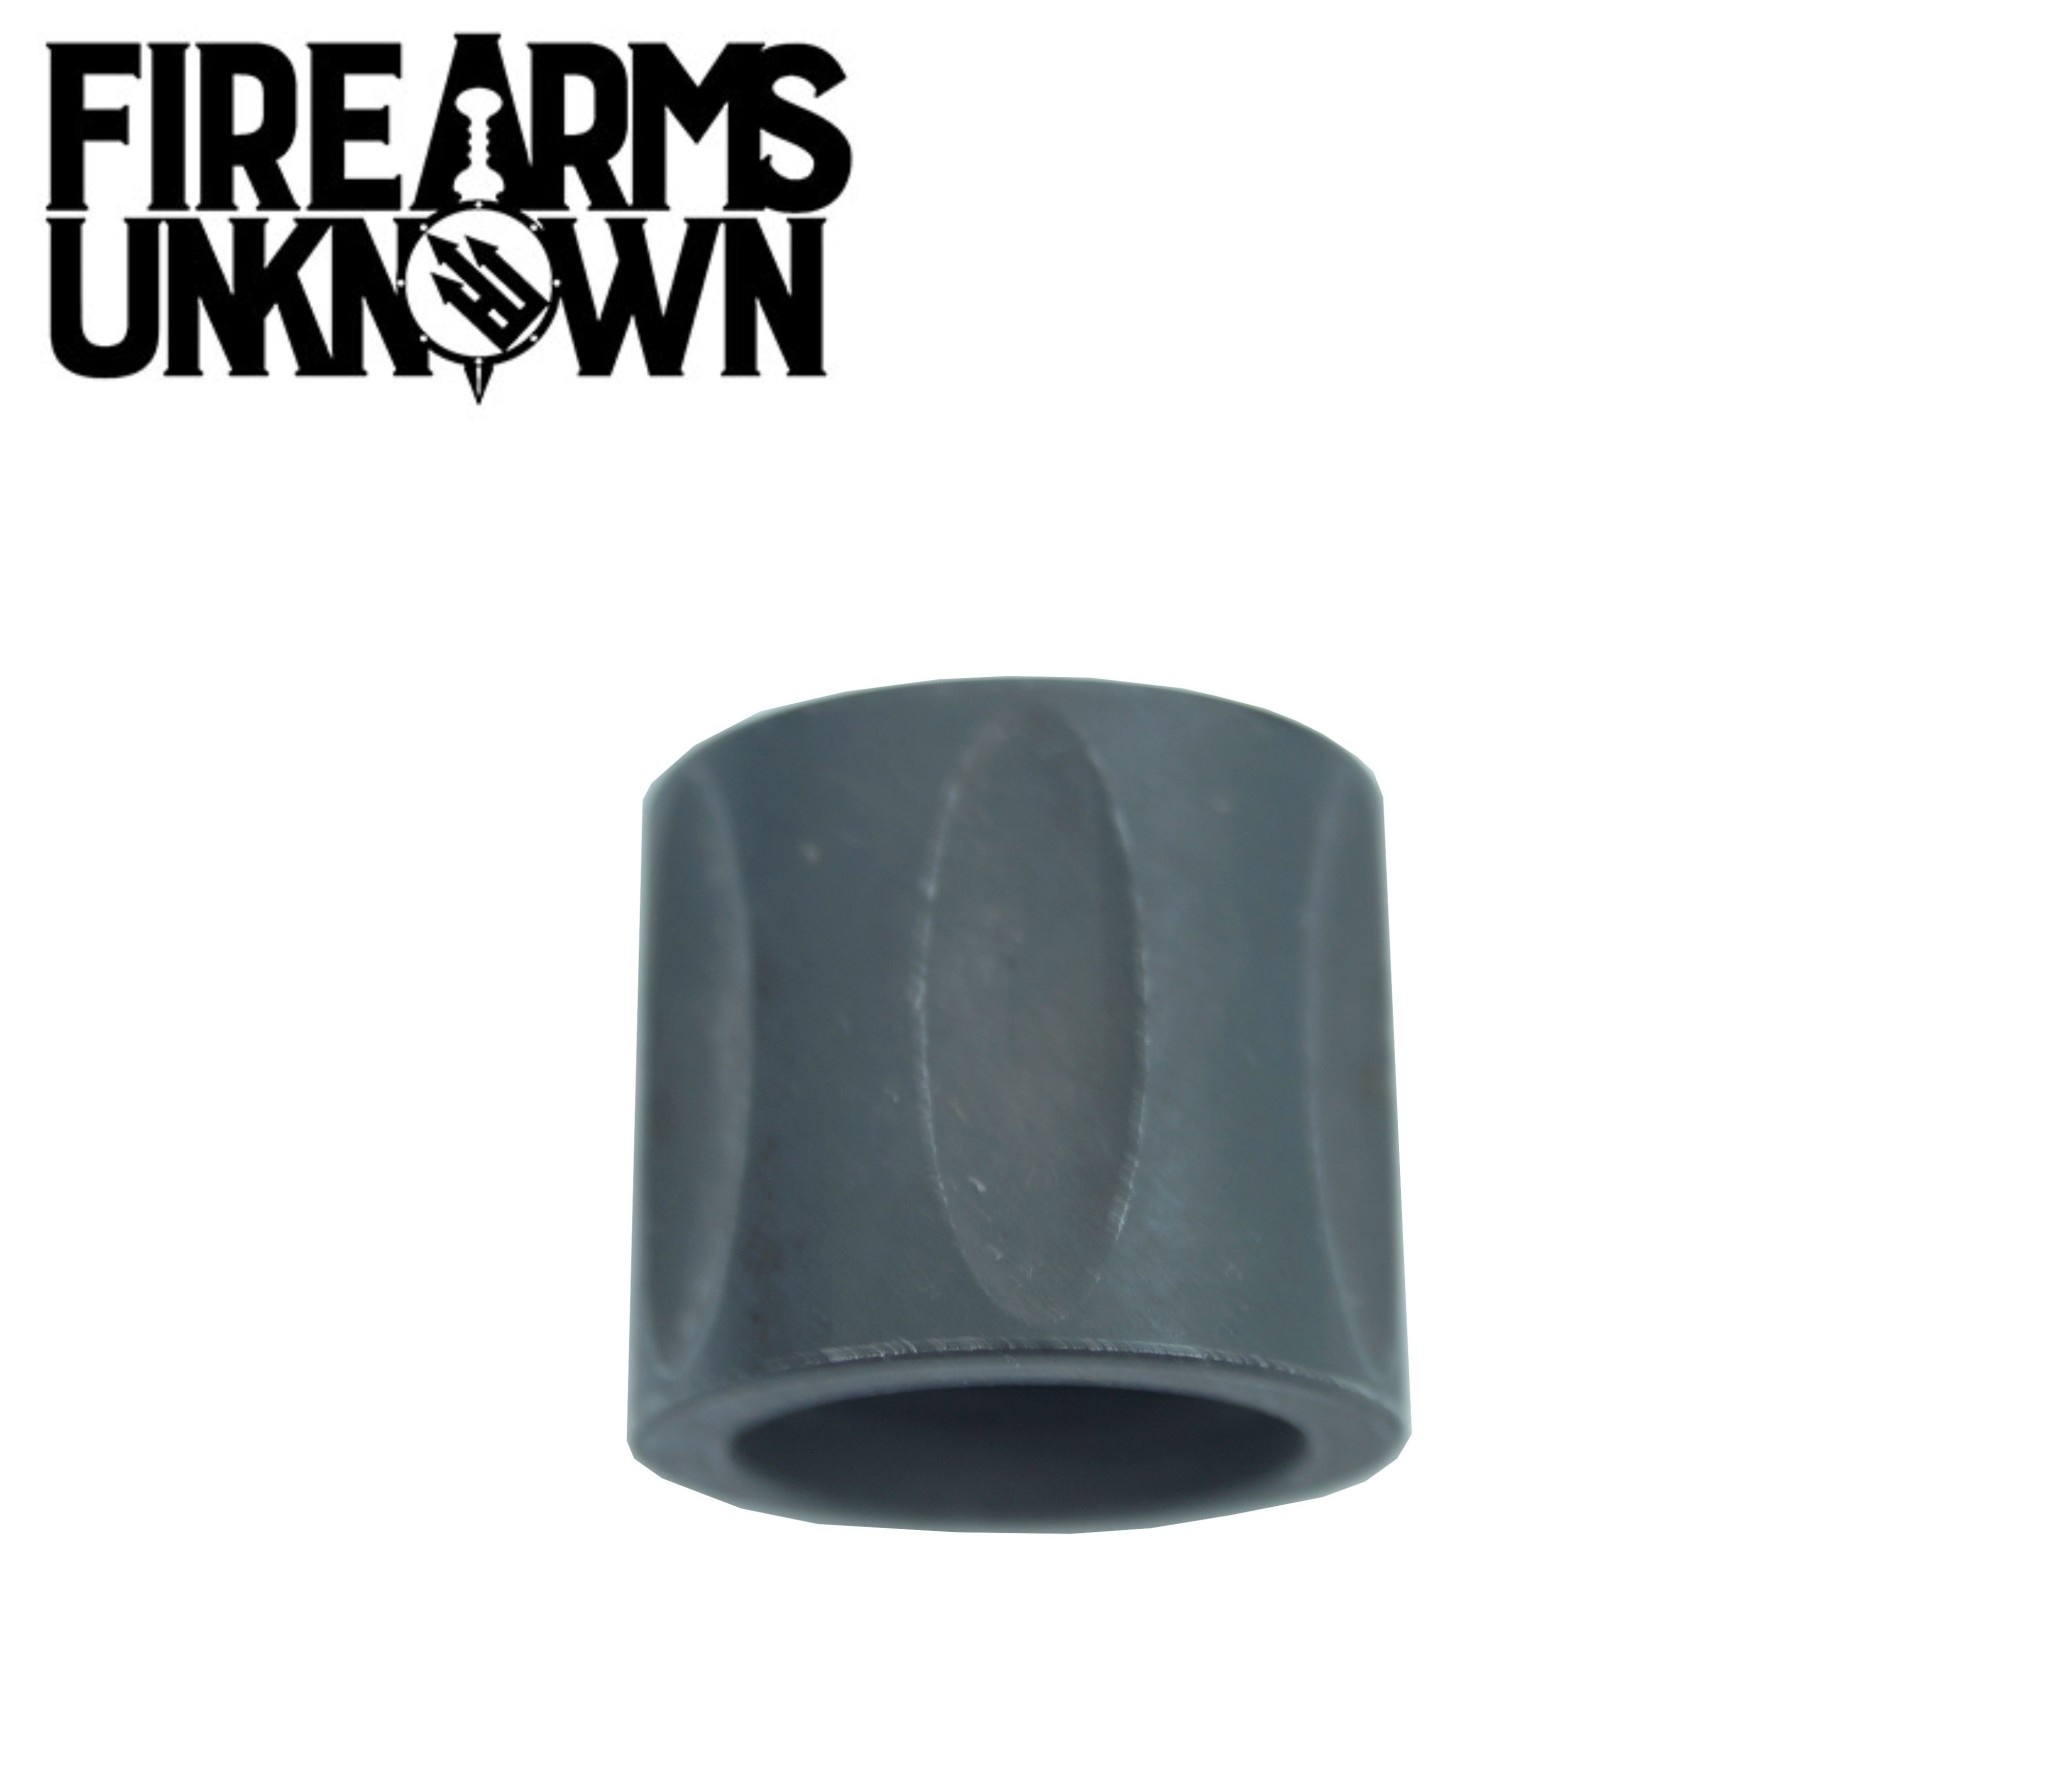 Blitzkrieg Thread Protector Black 5/8x24 LR308